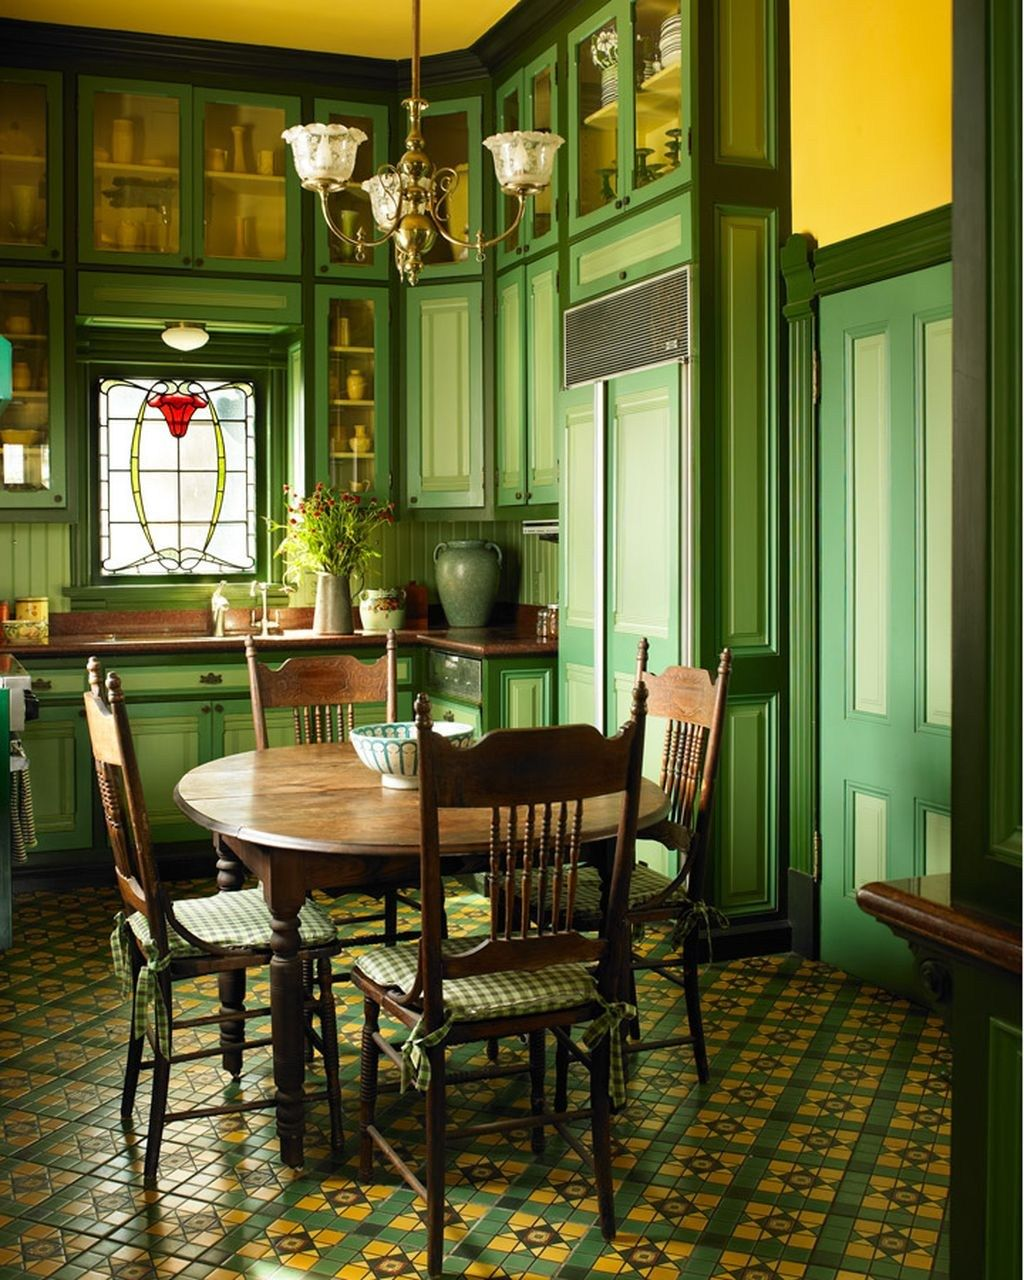 Period Kitchens Designs Renovation: Inspiring Traditional Victorian Kitchen Remodel Ideas 39